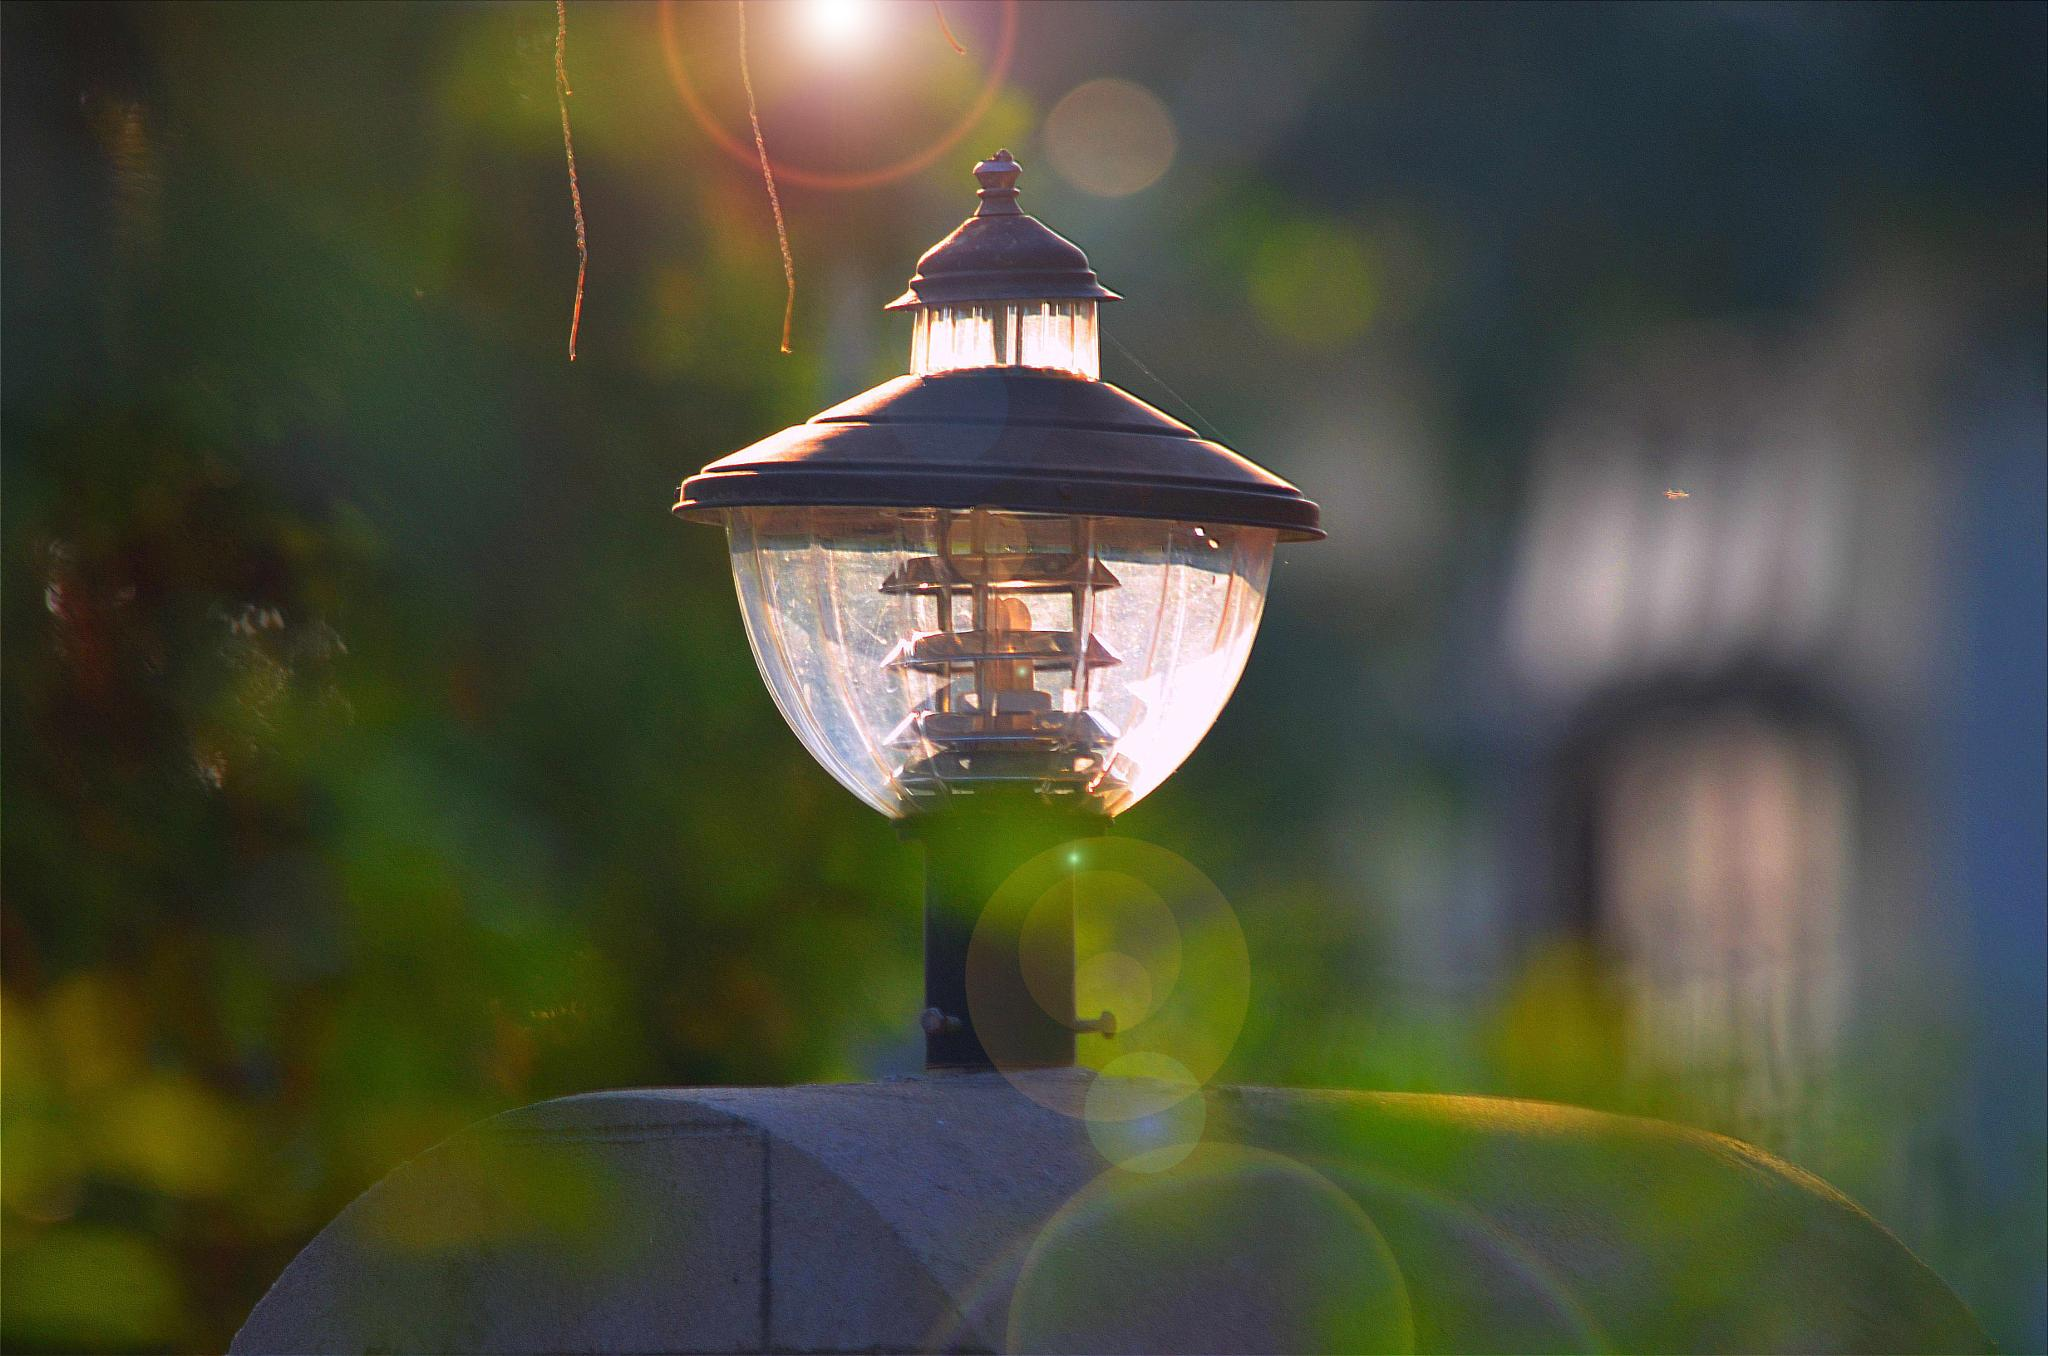 lamp by saikiasadananda